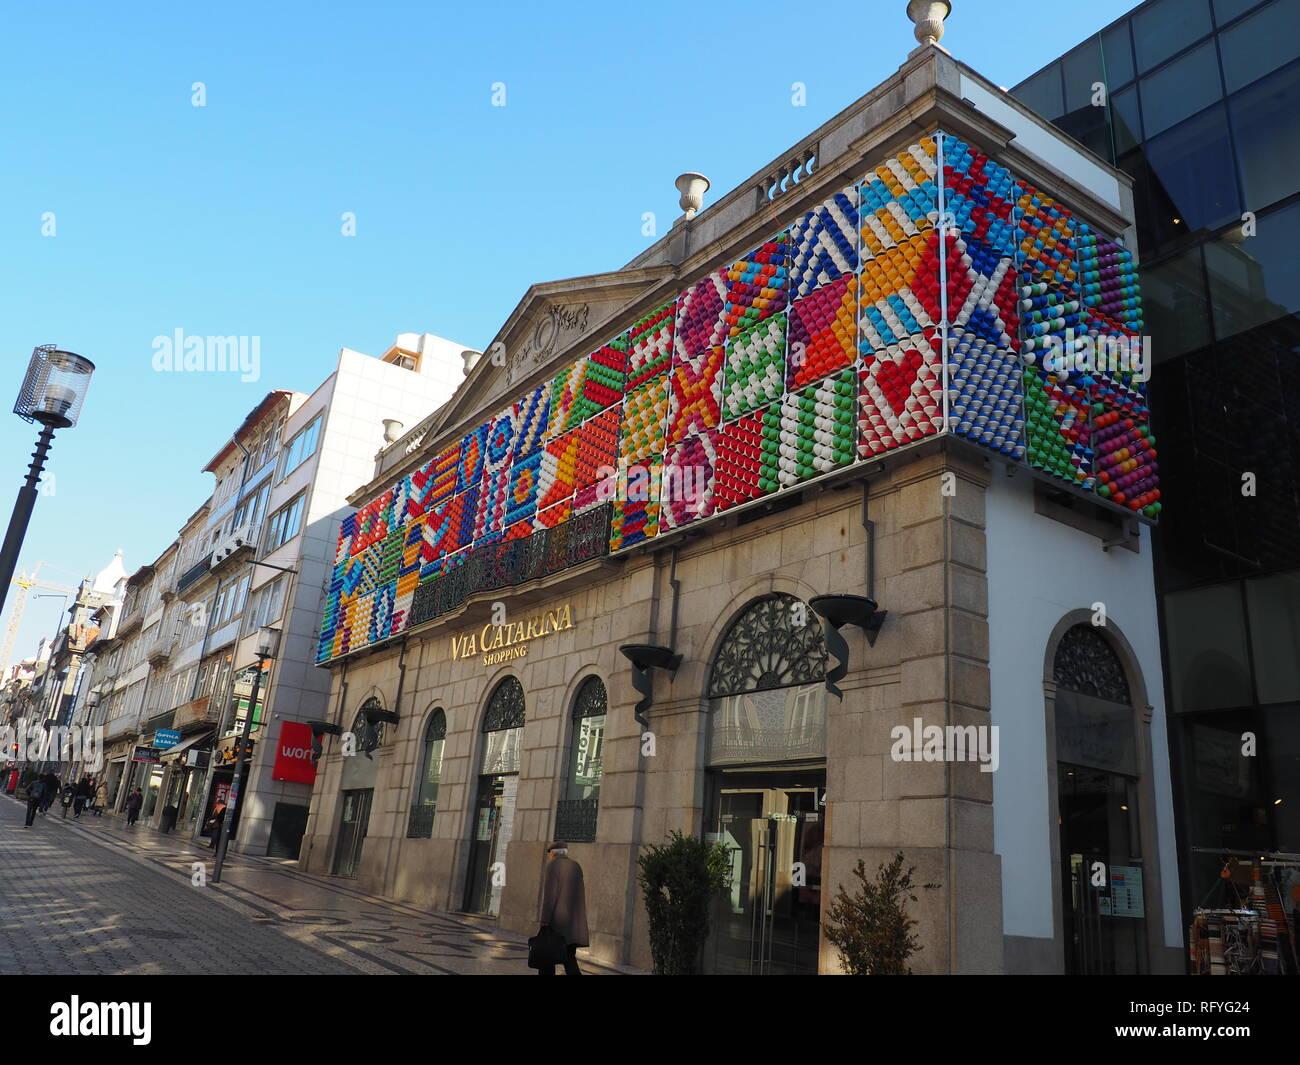 Tiles decorated Facade of Via Catarina shopping in Porto - Portugal - Stock Image